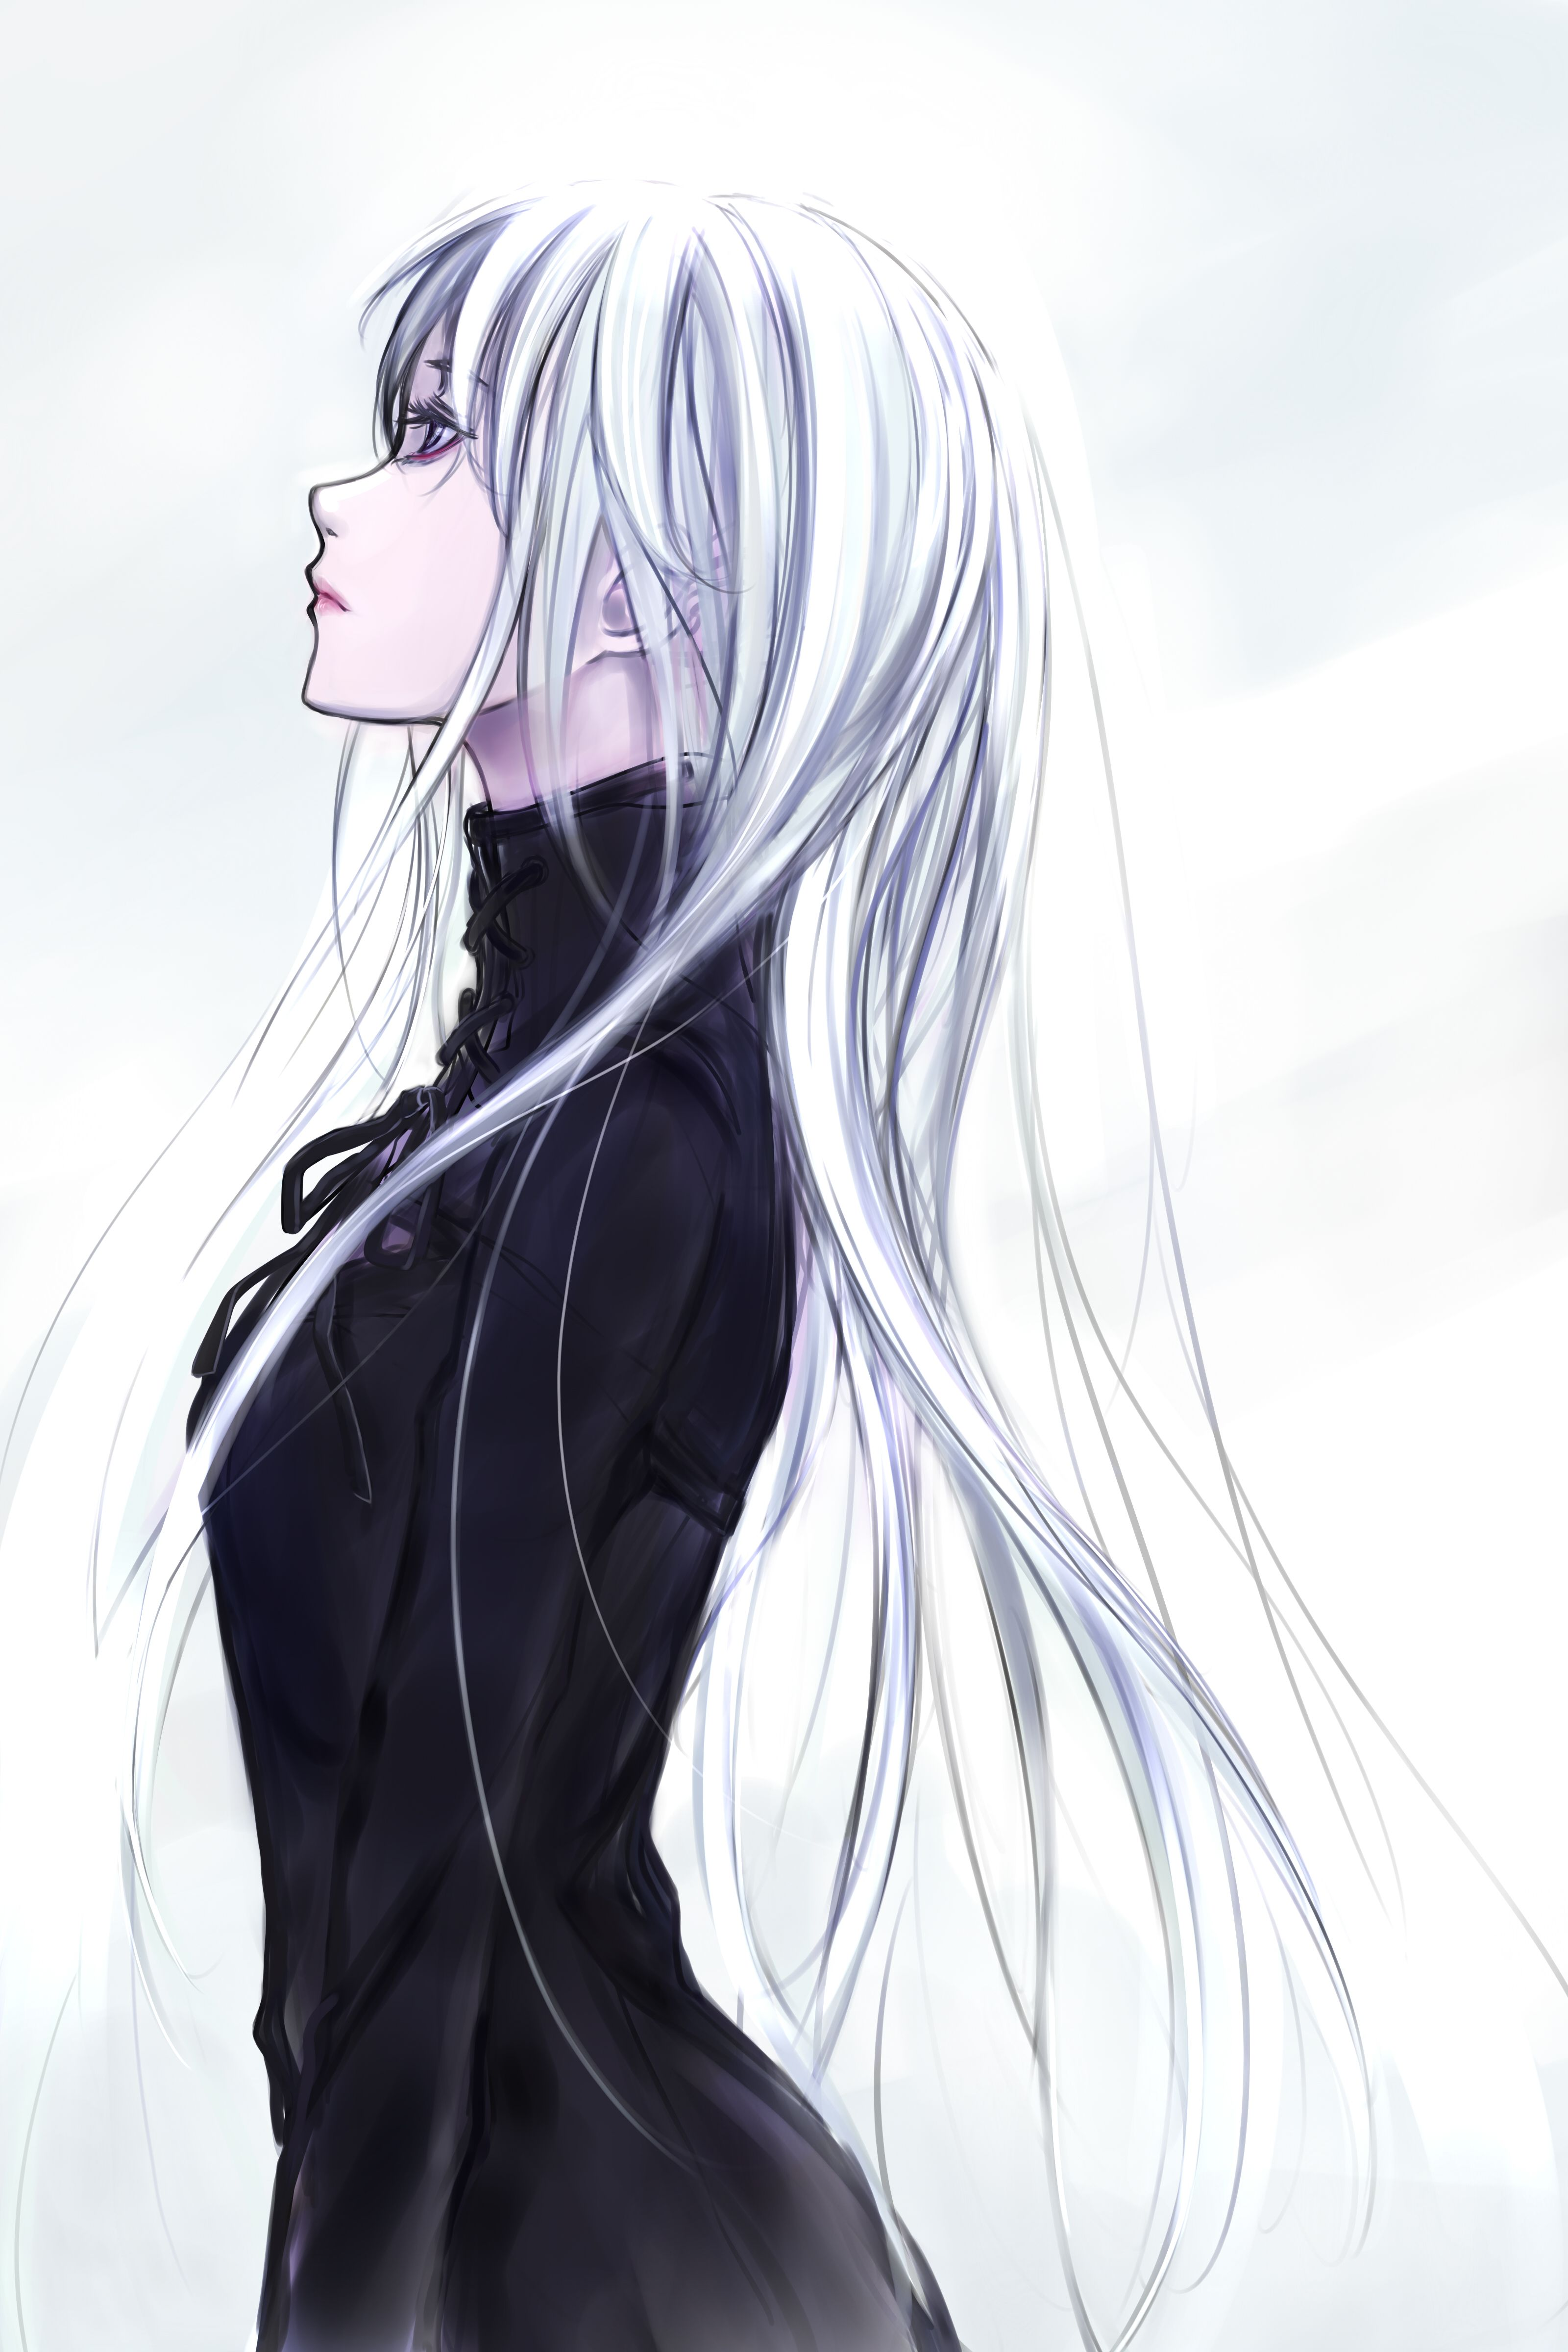 Pin by Mari Sawon on anime Anime art girl